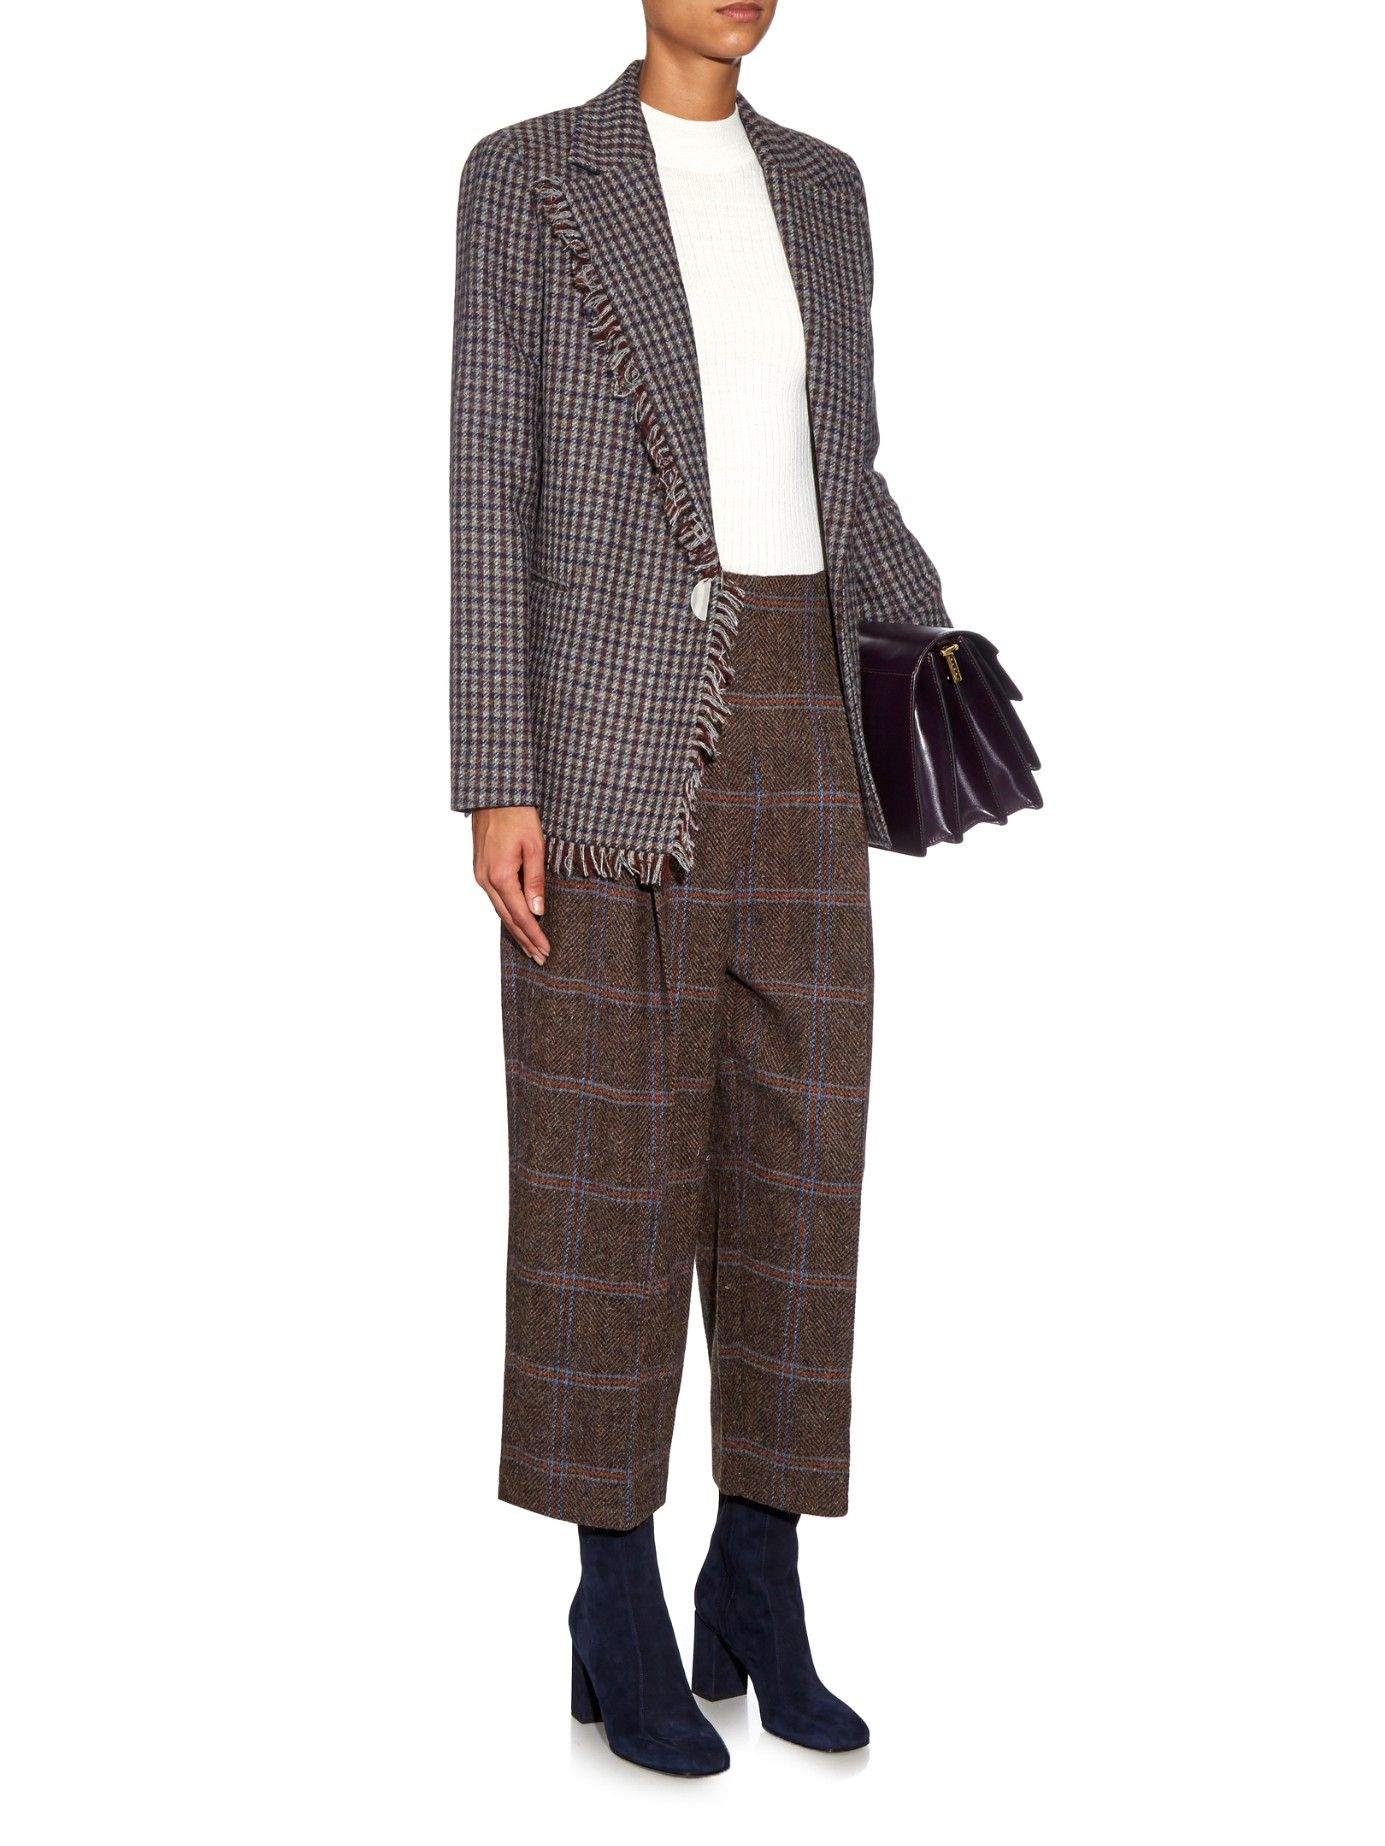 Reims British Shetland tweed jacket | Acne Studios